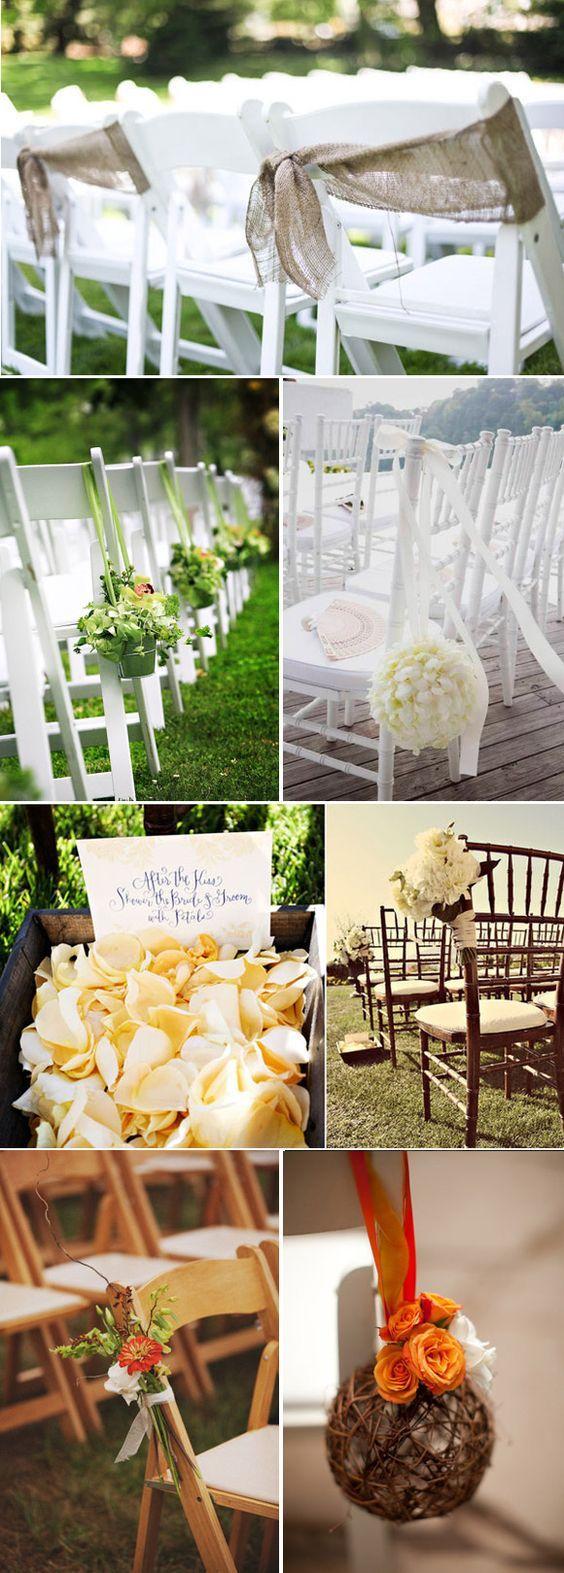 502 best images about ambientaci n y decoraci n para bodas for Ambientacion para bodas